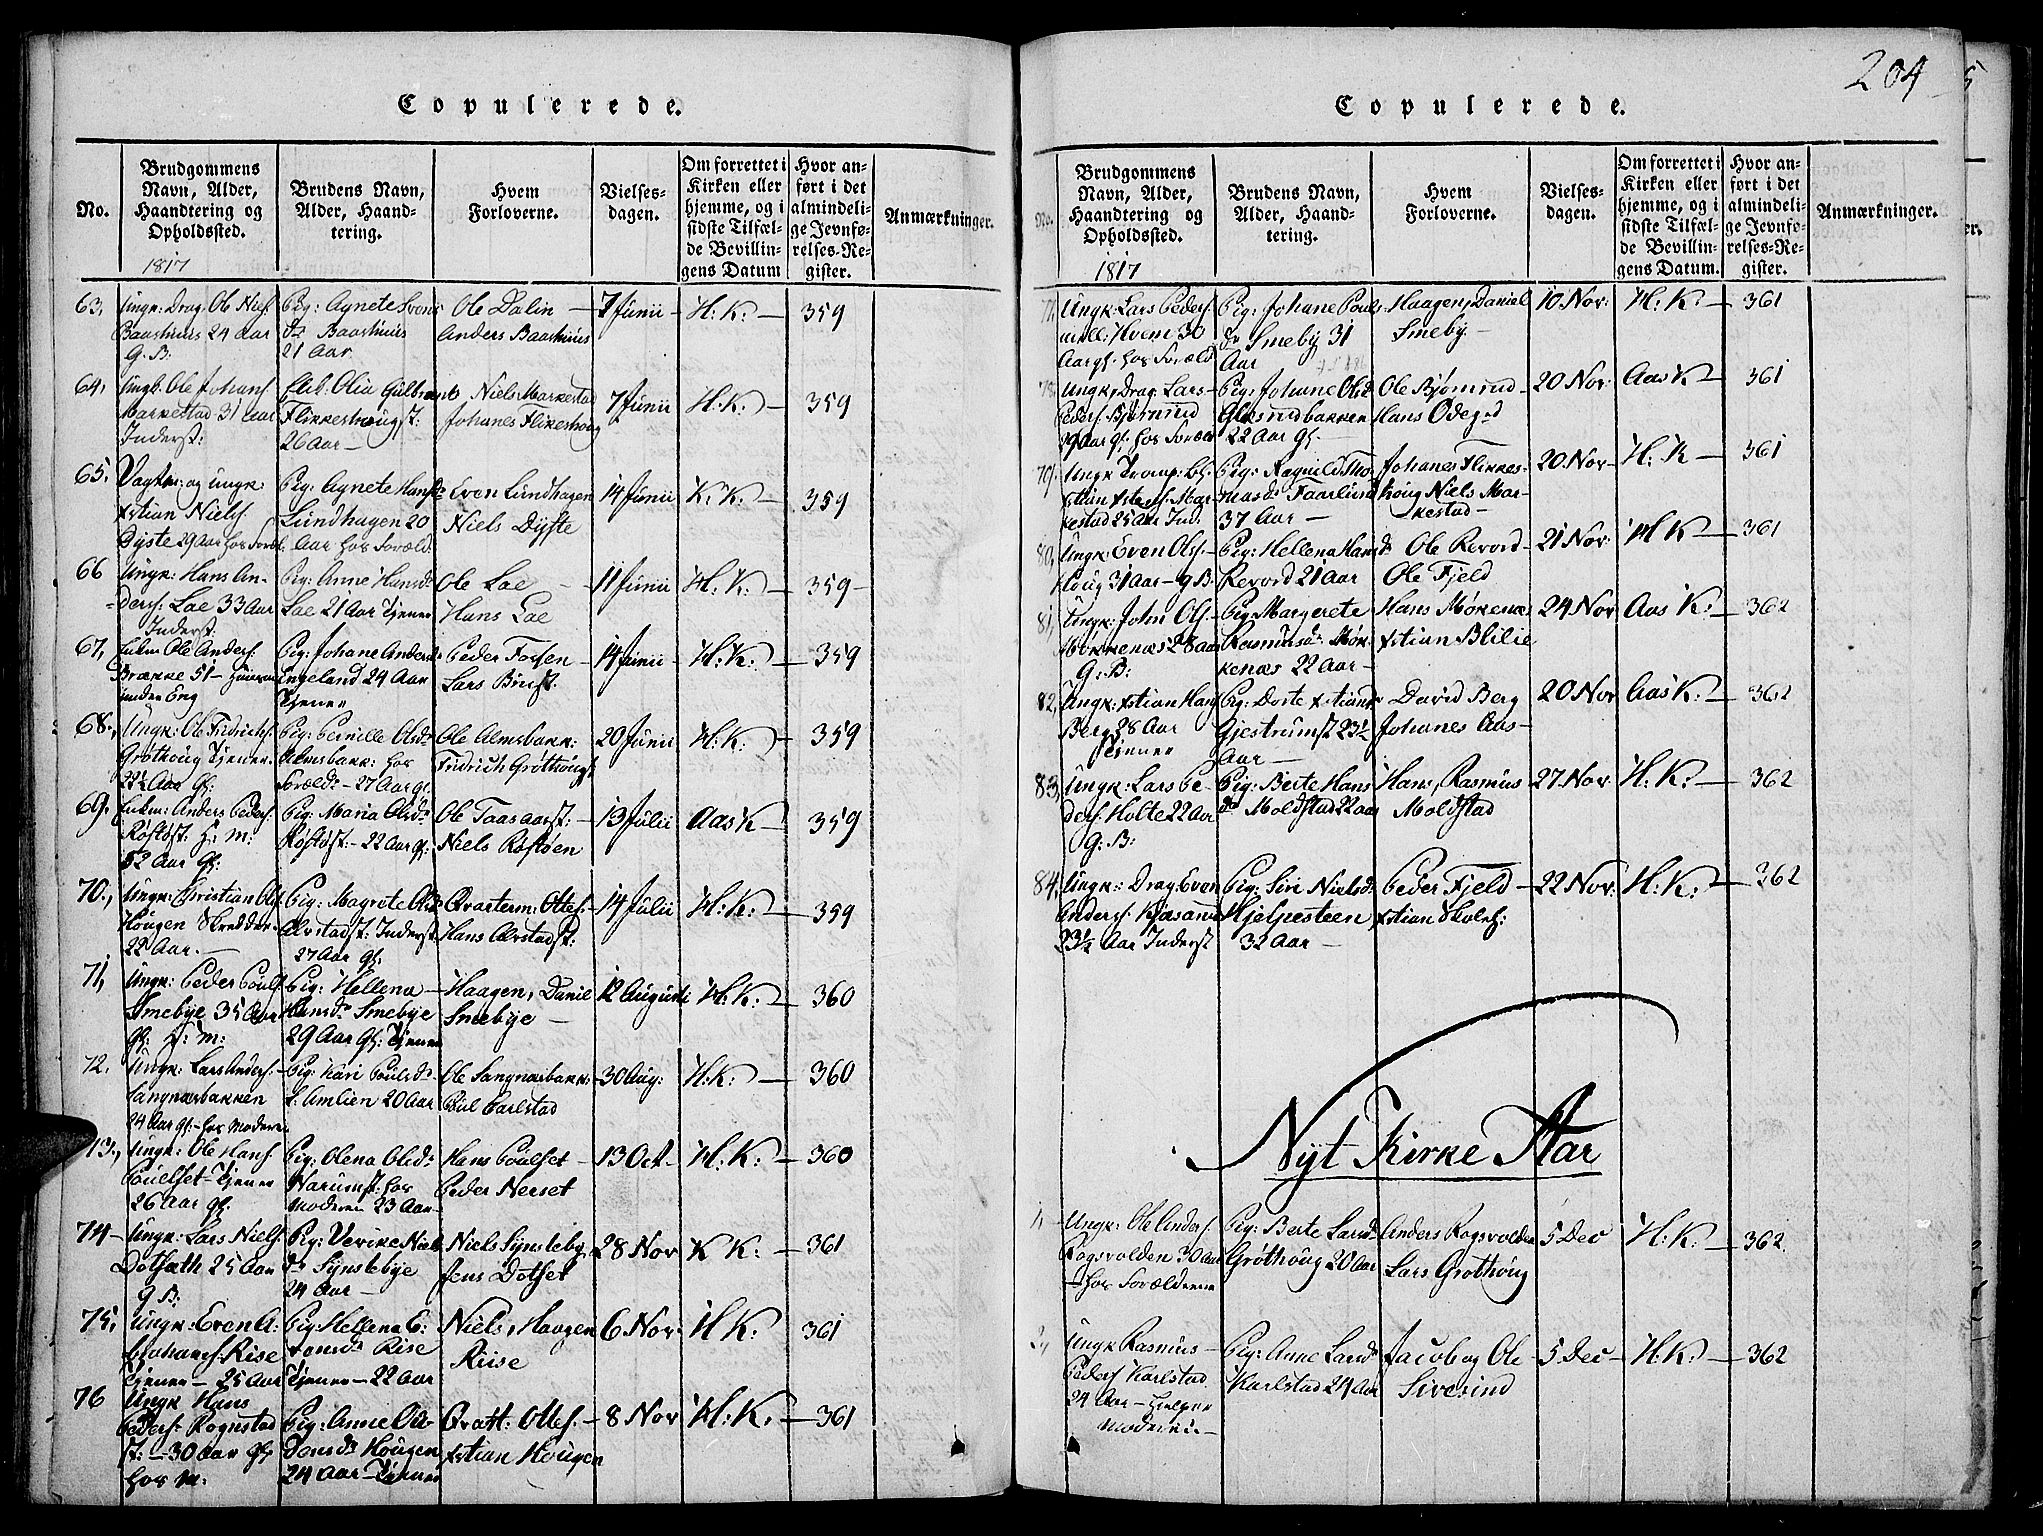 SAH, Toten prestekontor, Ministerialbok nr. 9, 1814-1820, s. 204